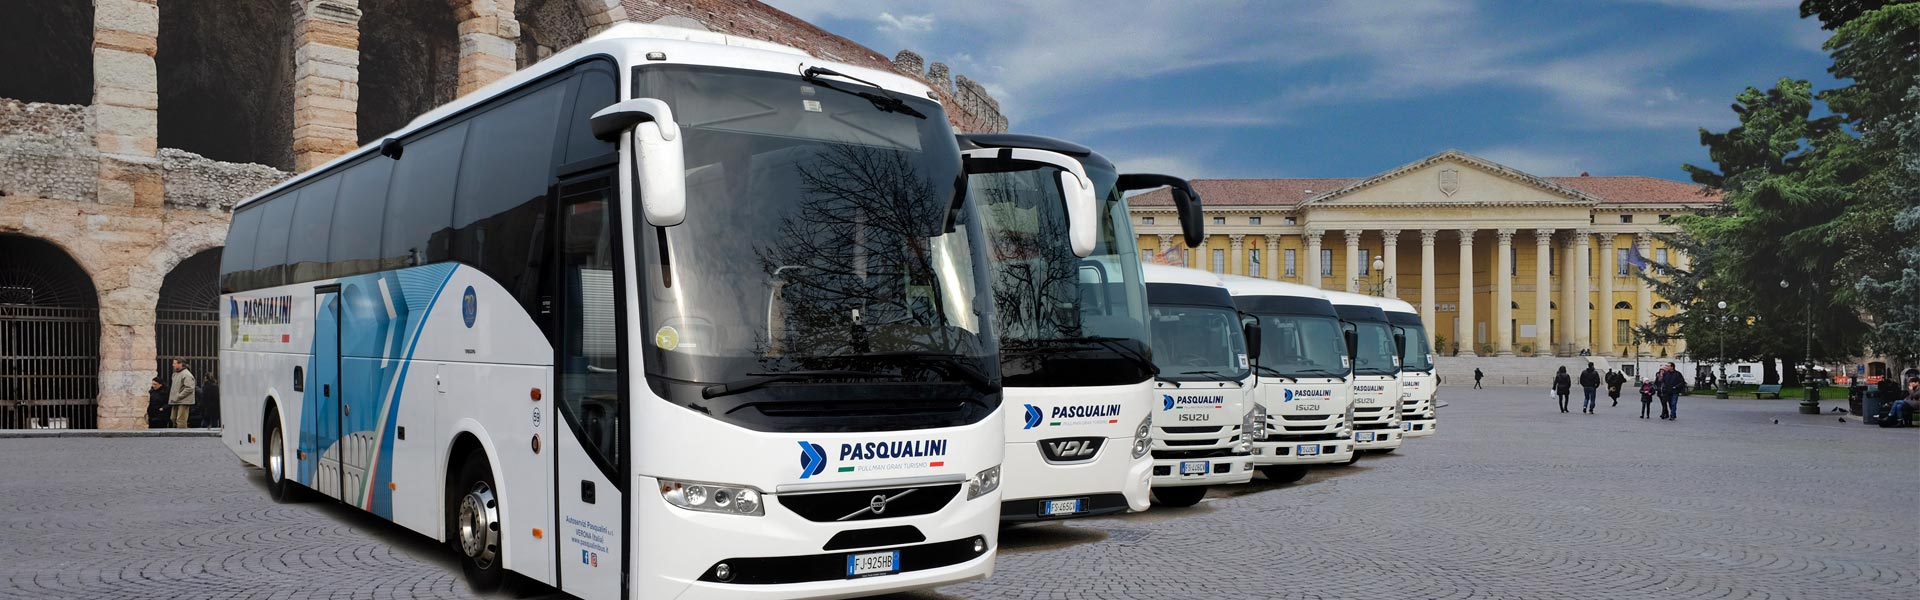 pasqualini-arena-visual-web